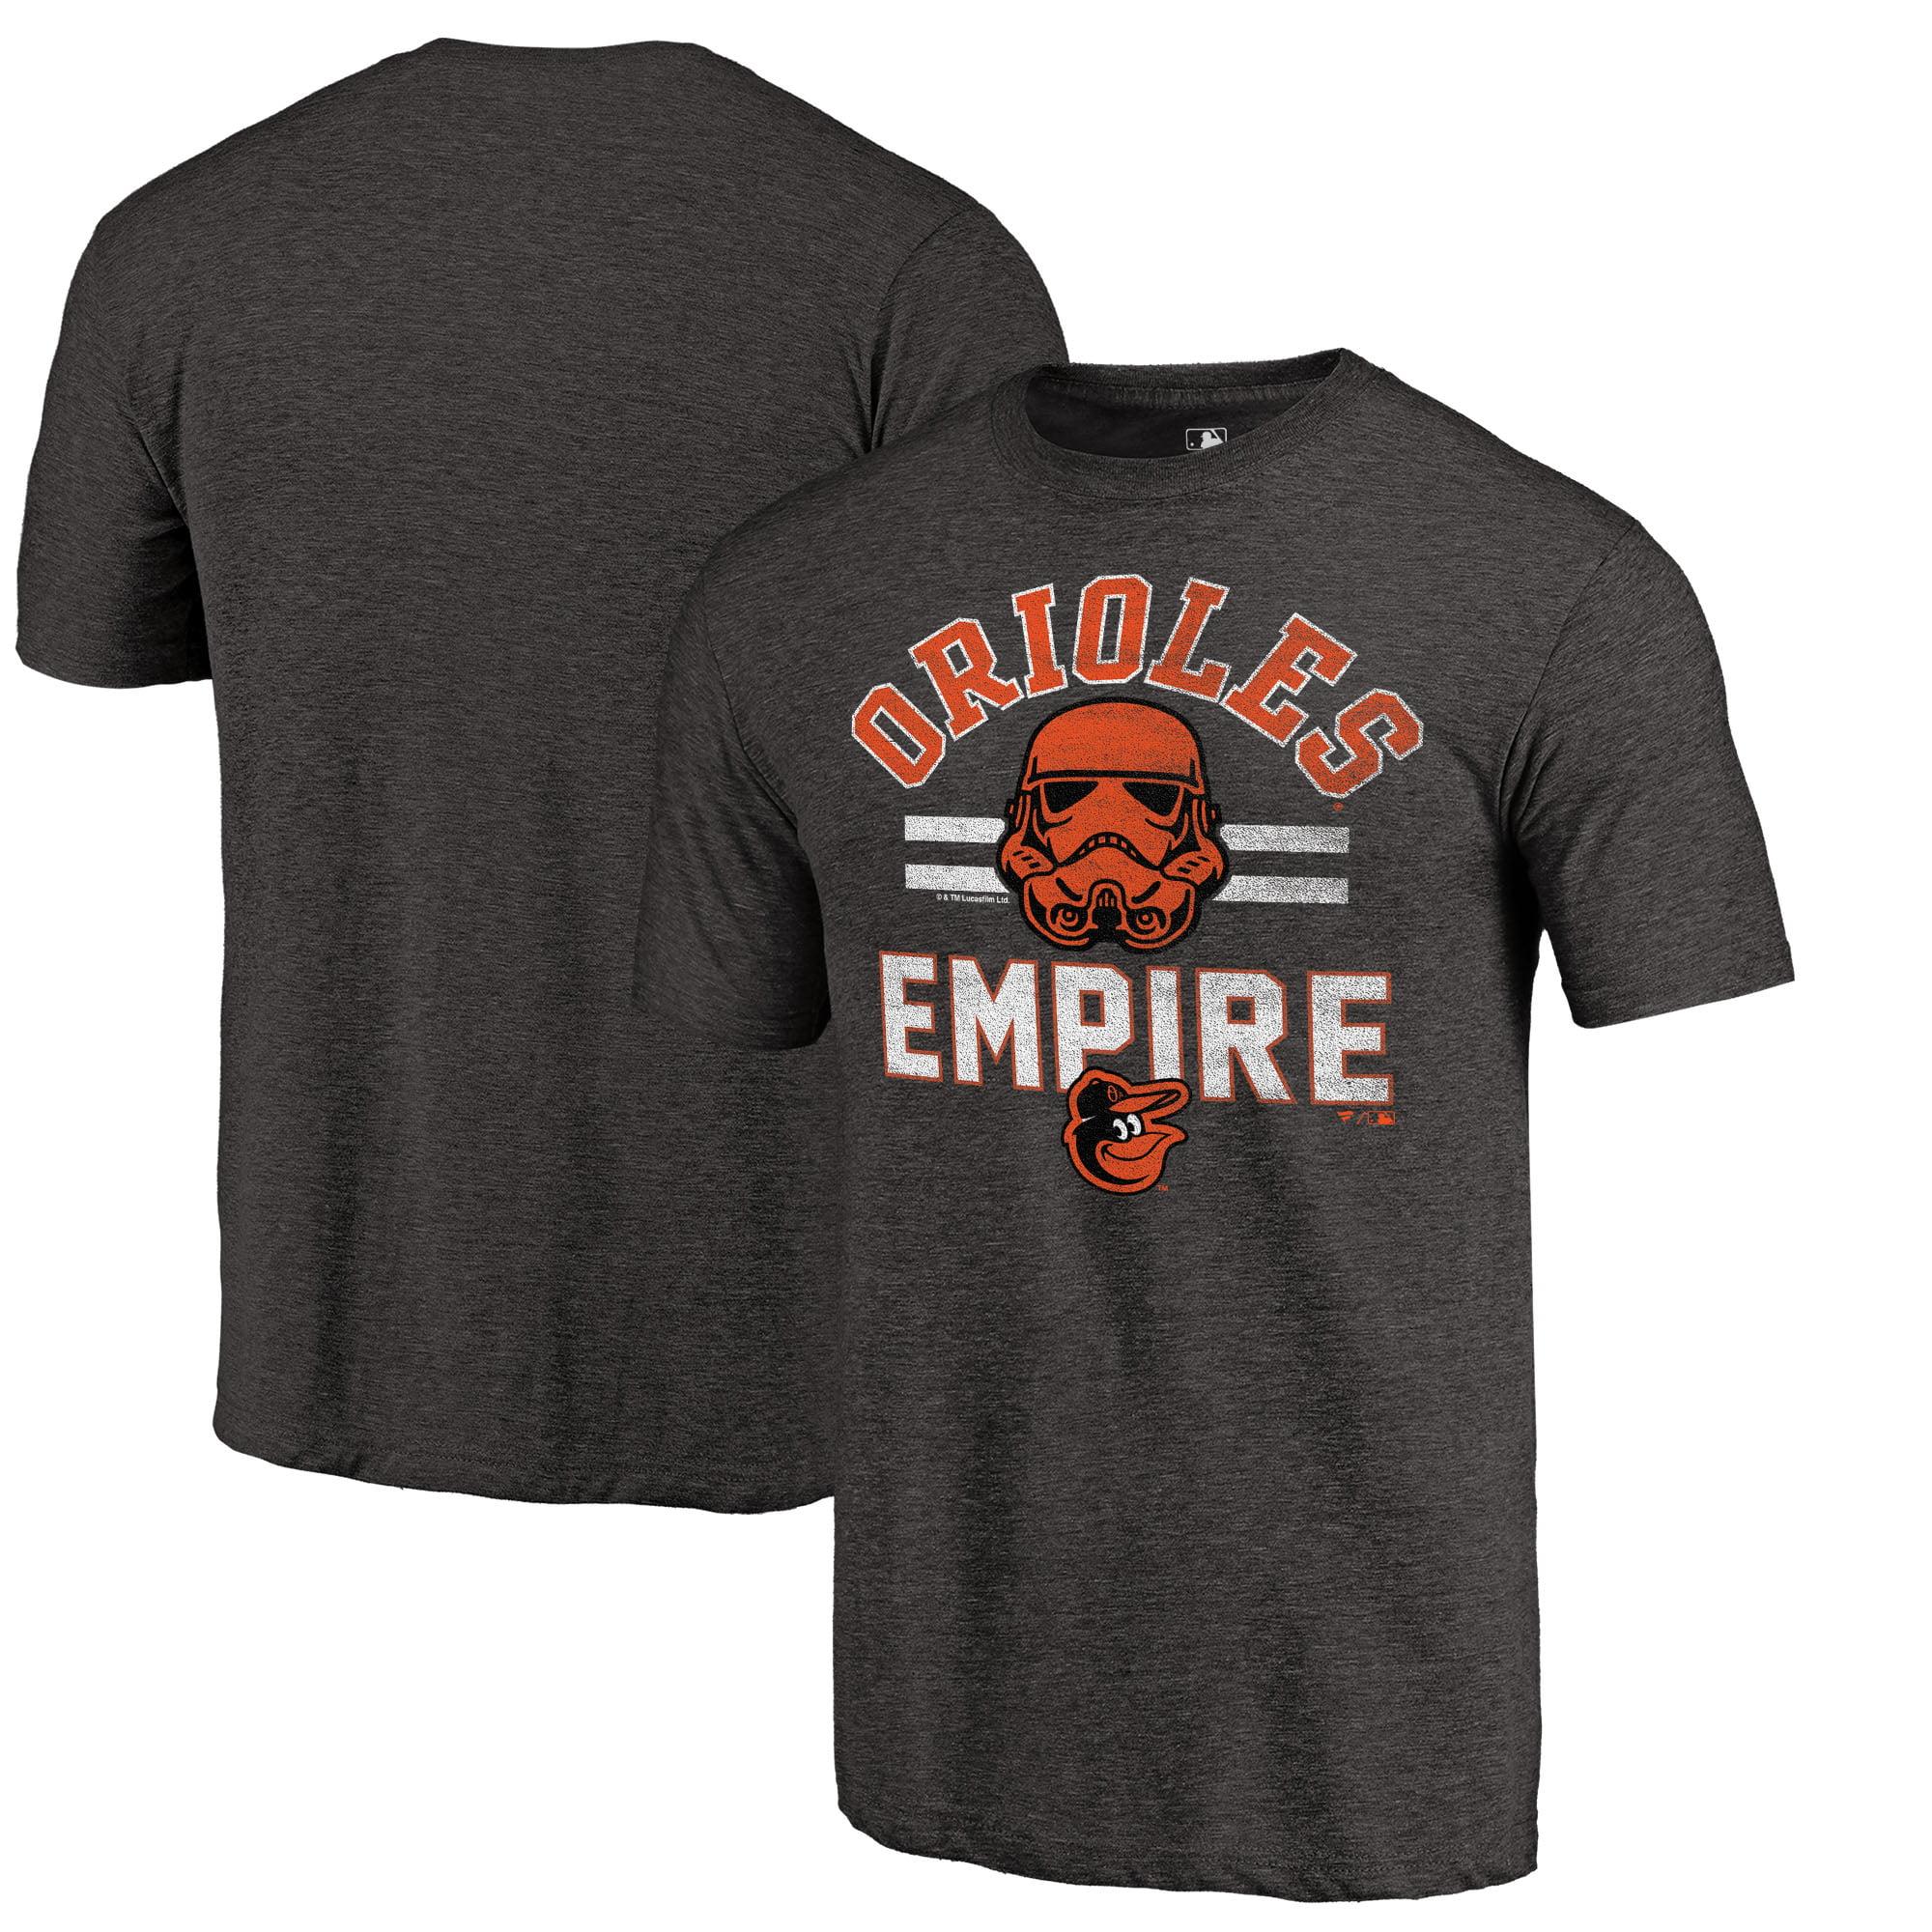 Baltimore Orioles Fanatics Branded MLB Star Wars Empire Tri-Blend T-Shirt - Black